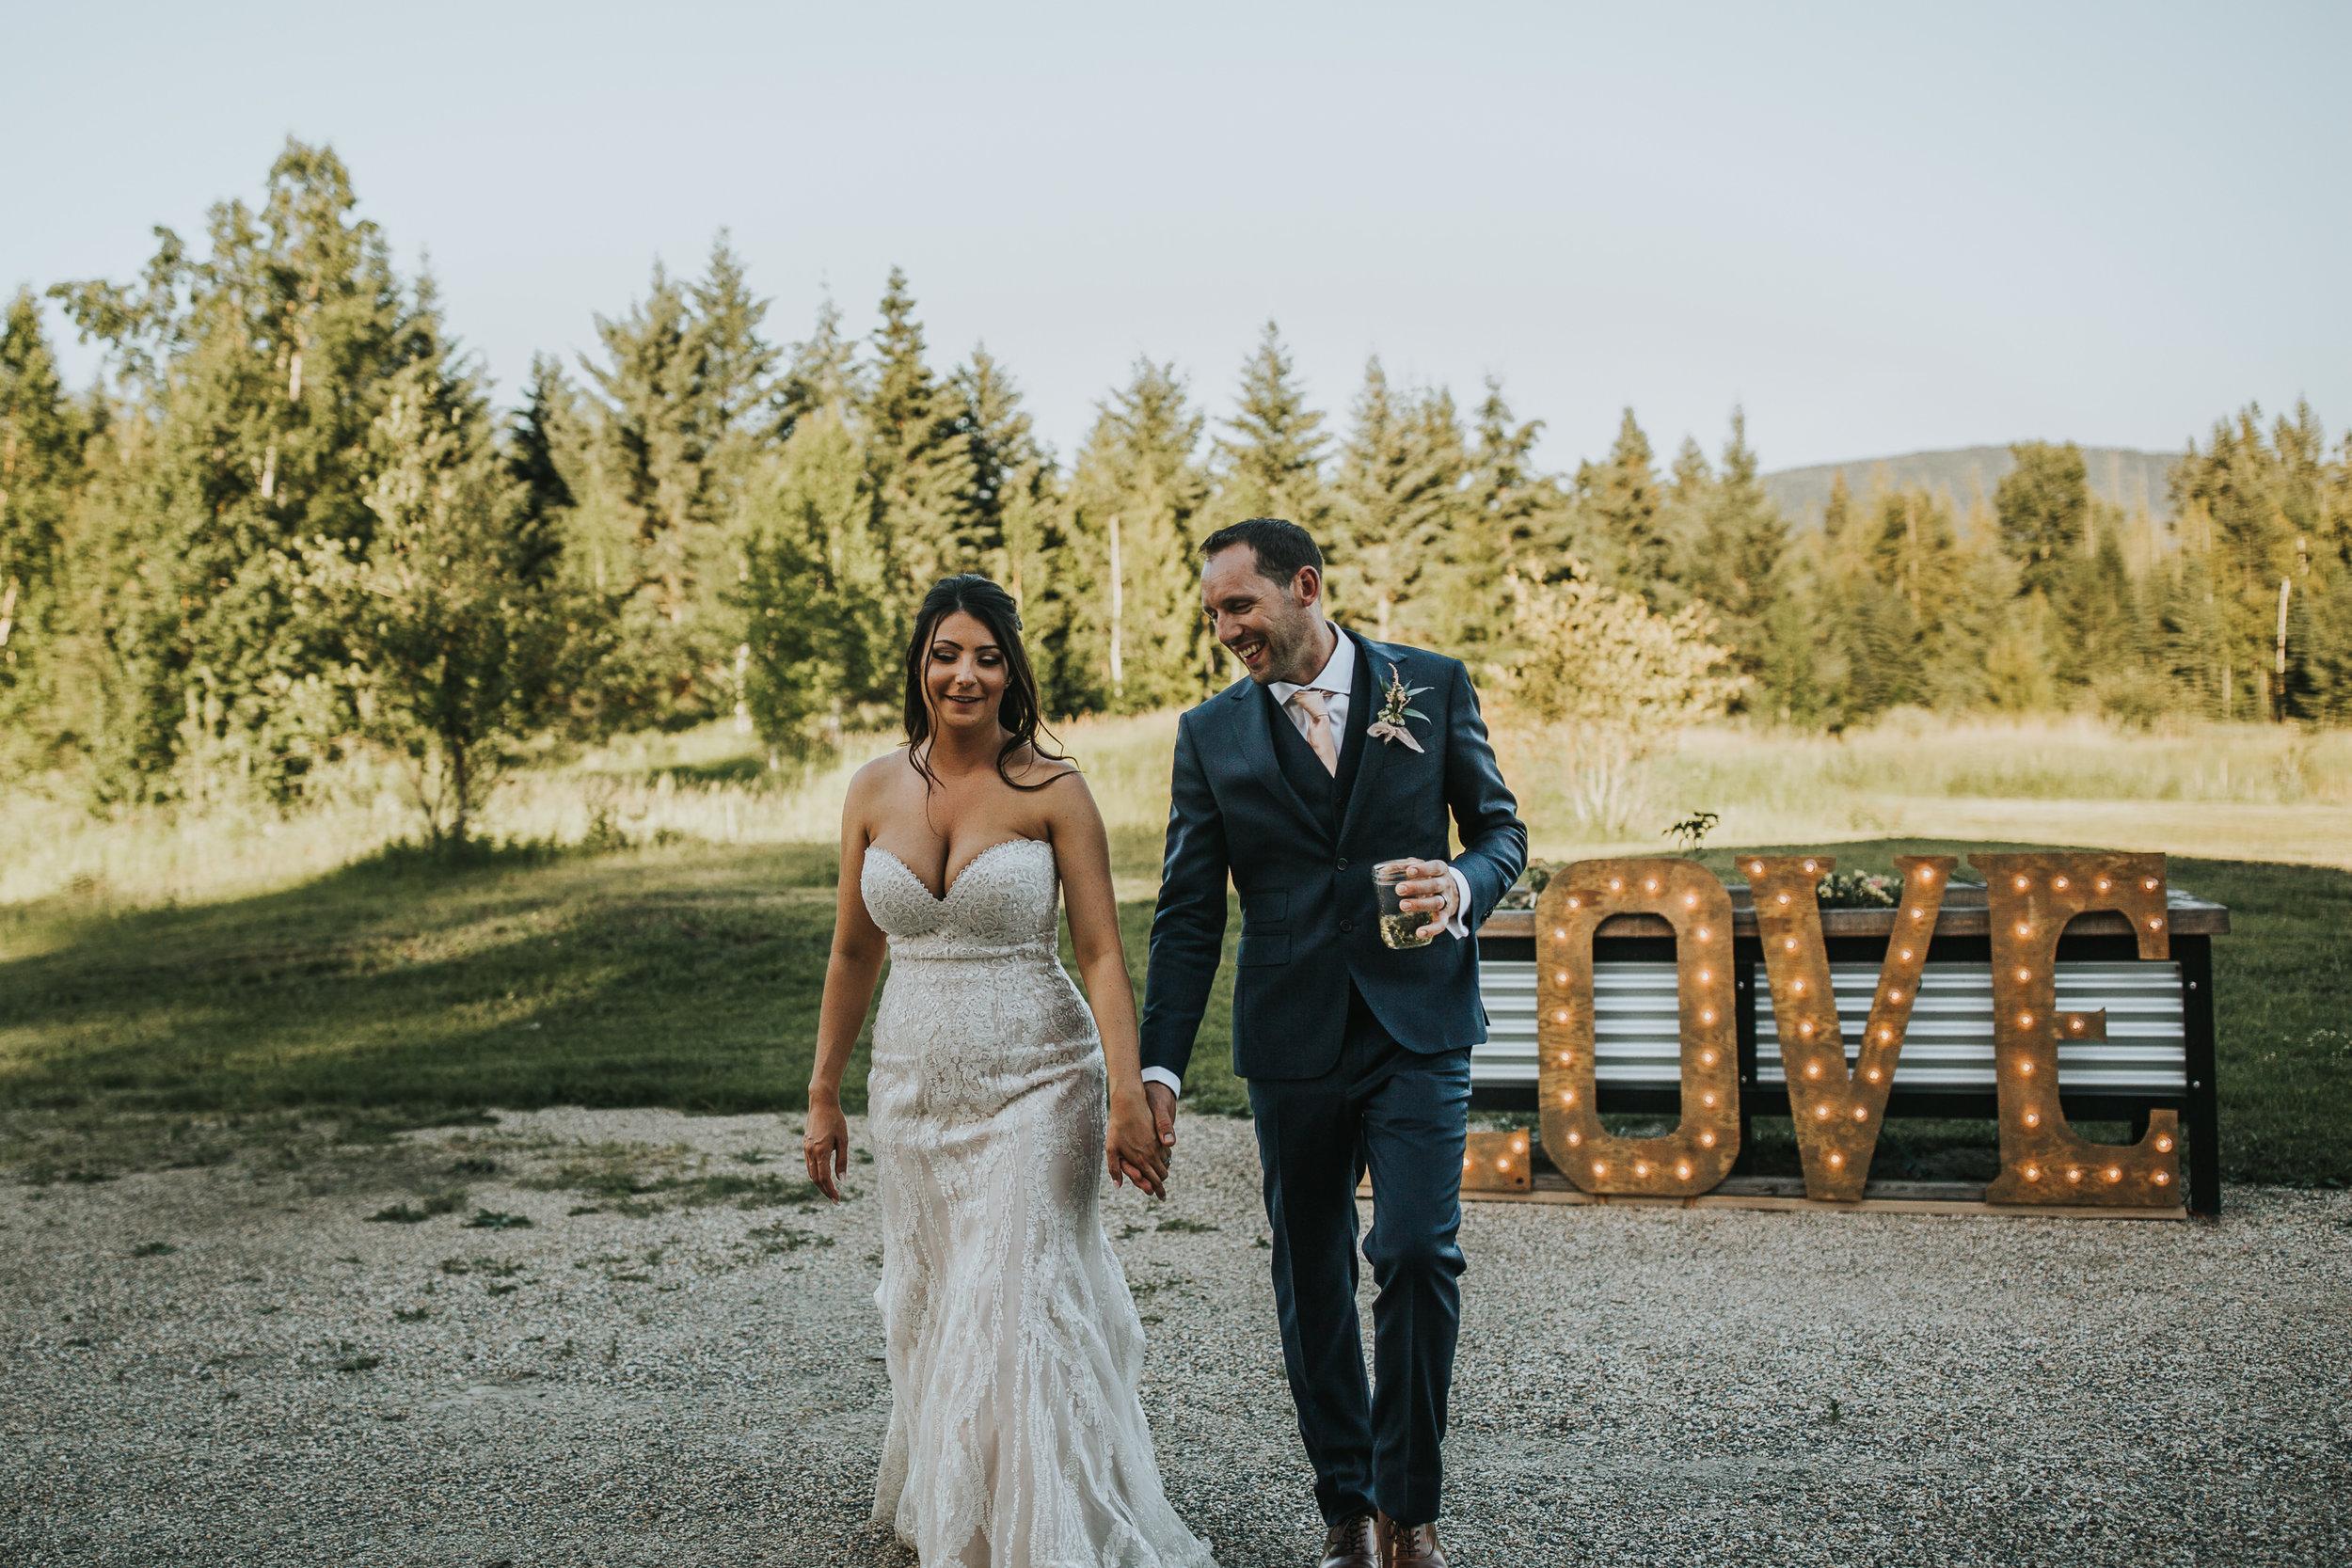 Kamloops-Shuswap-Wedding-R&K-Blog-Mint-Photography-89.jpg